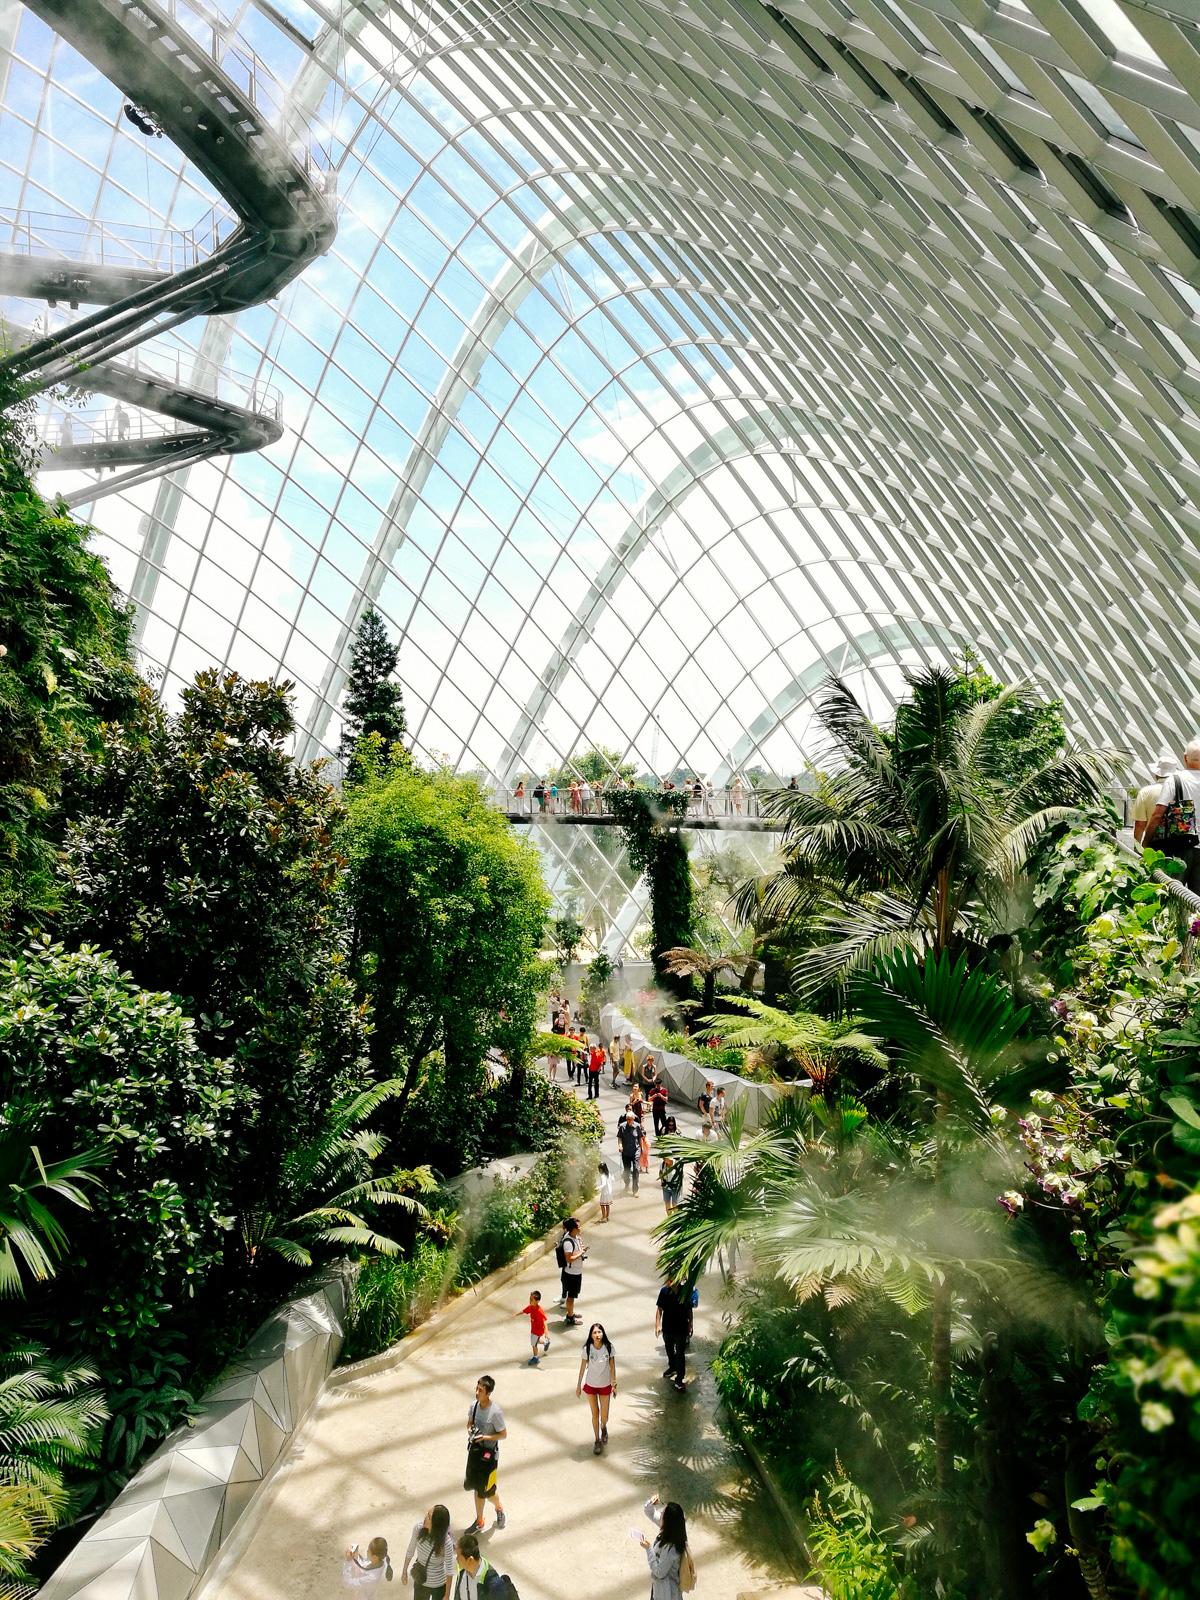 Cloud forest o la selva nubosa